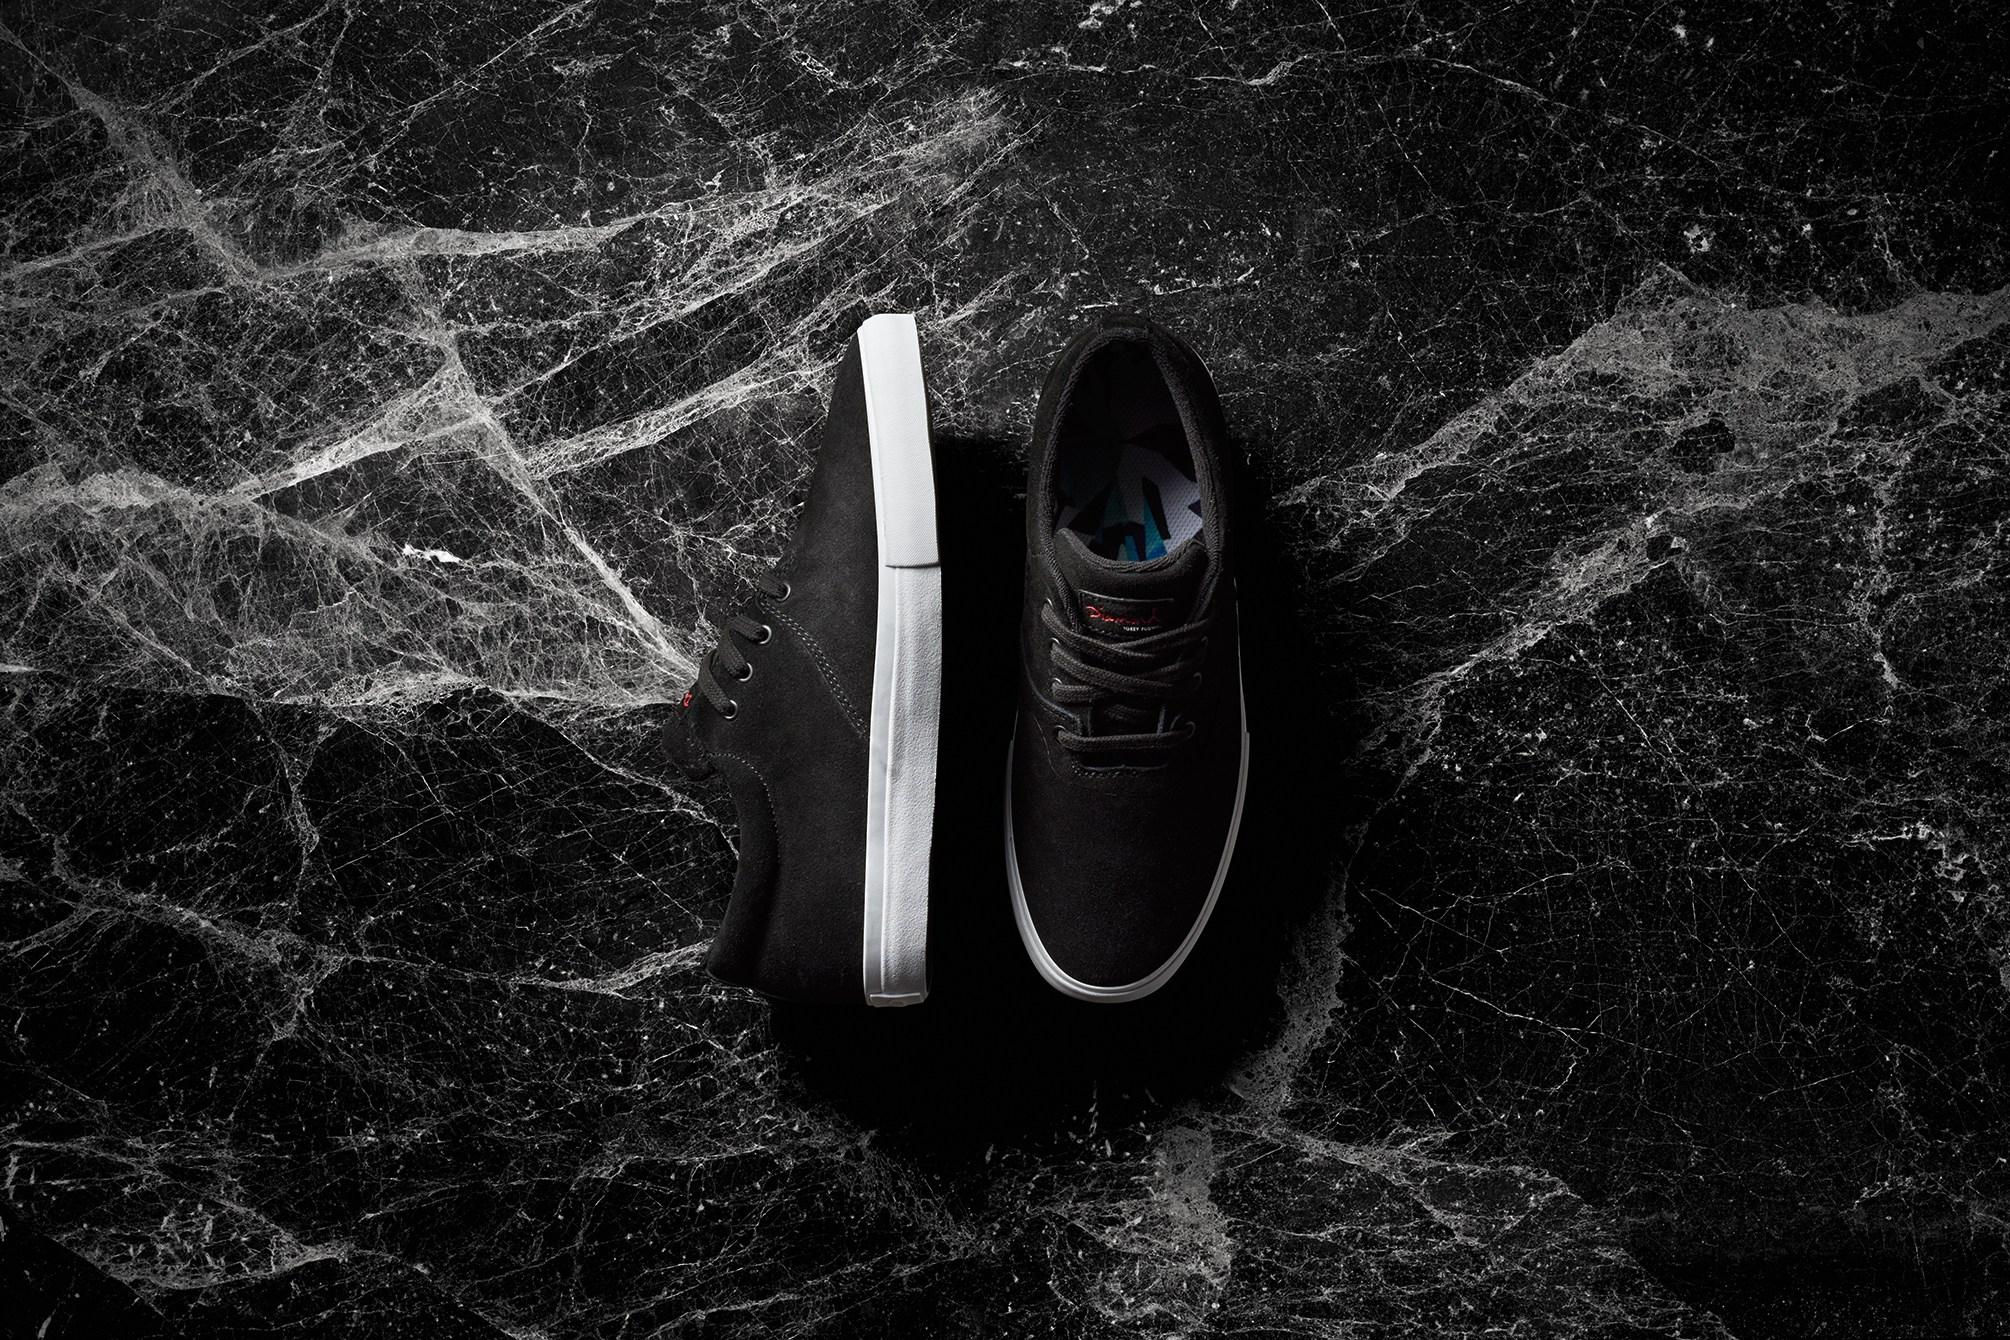 diamond-supply-co-launches-footwear-4.jpg